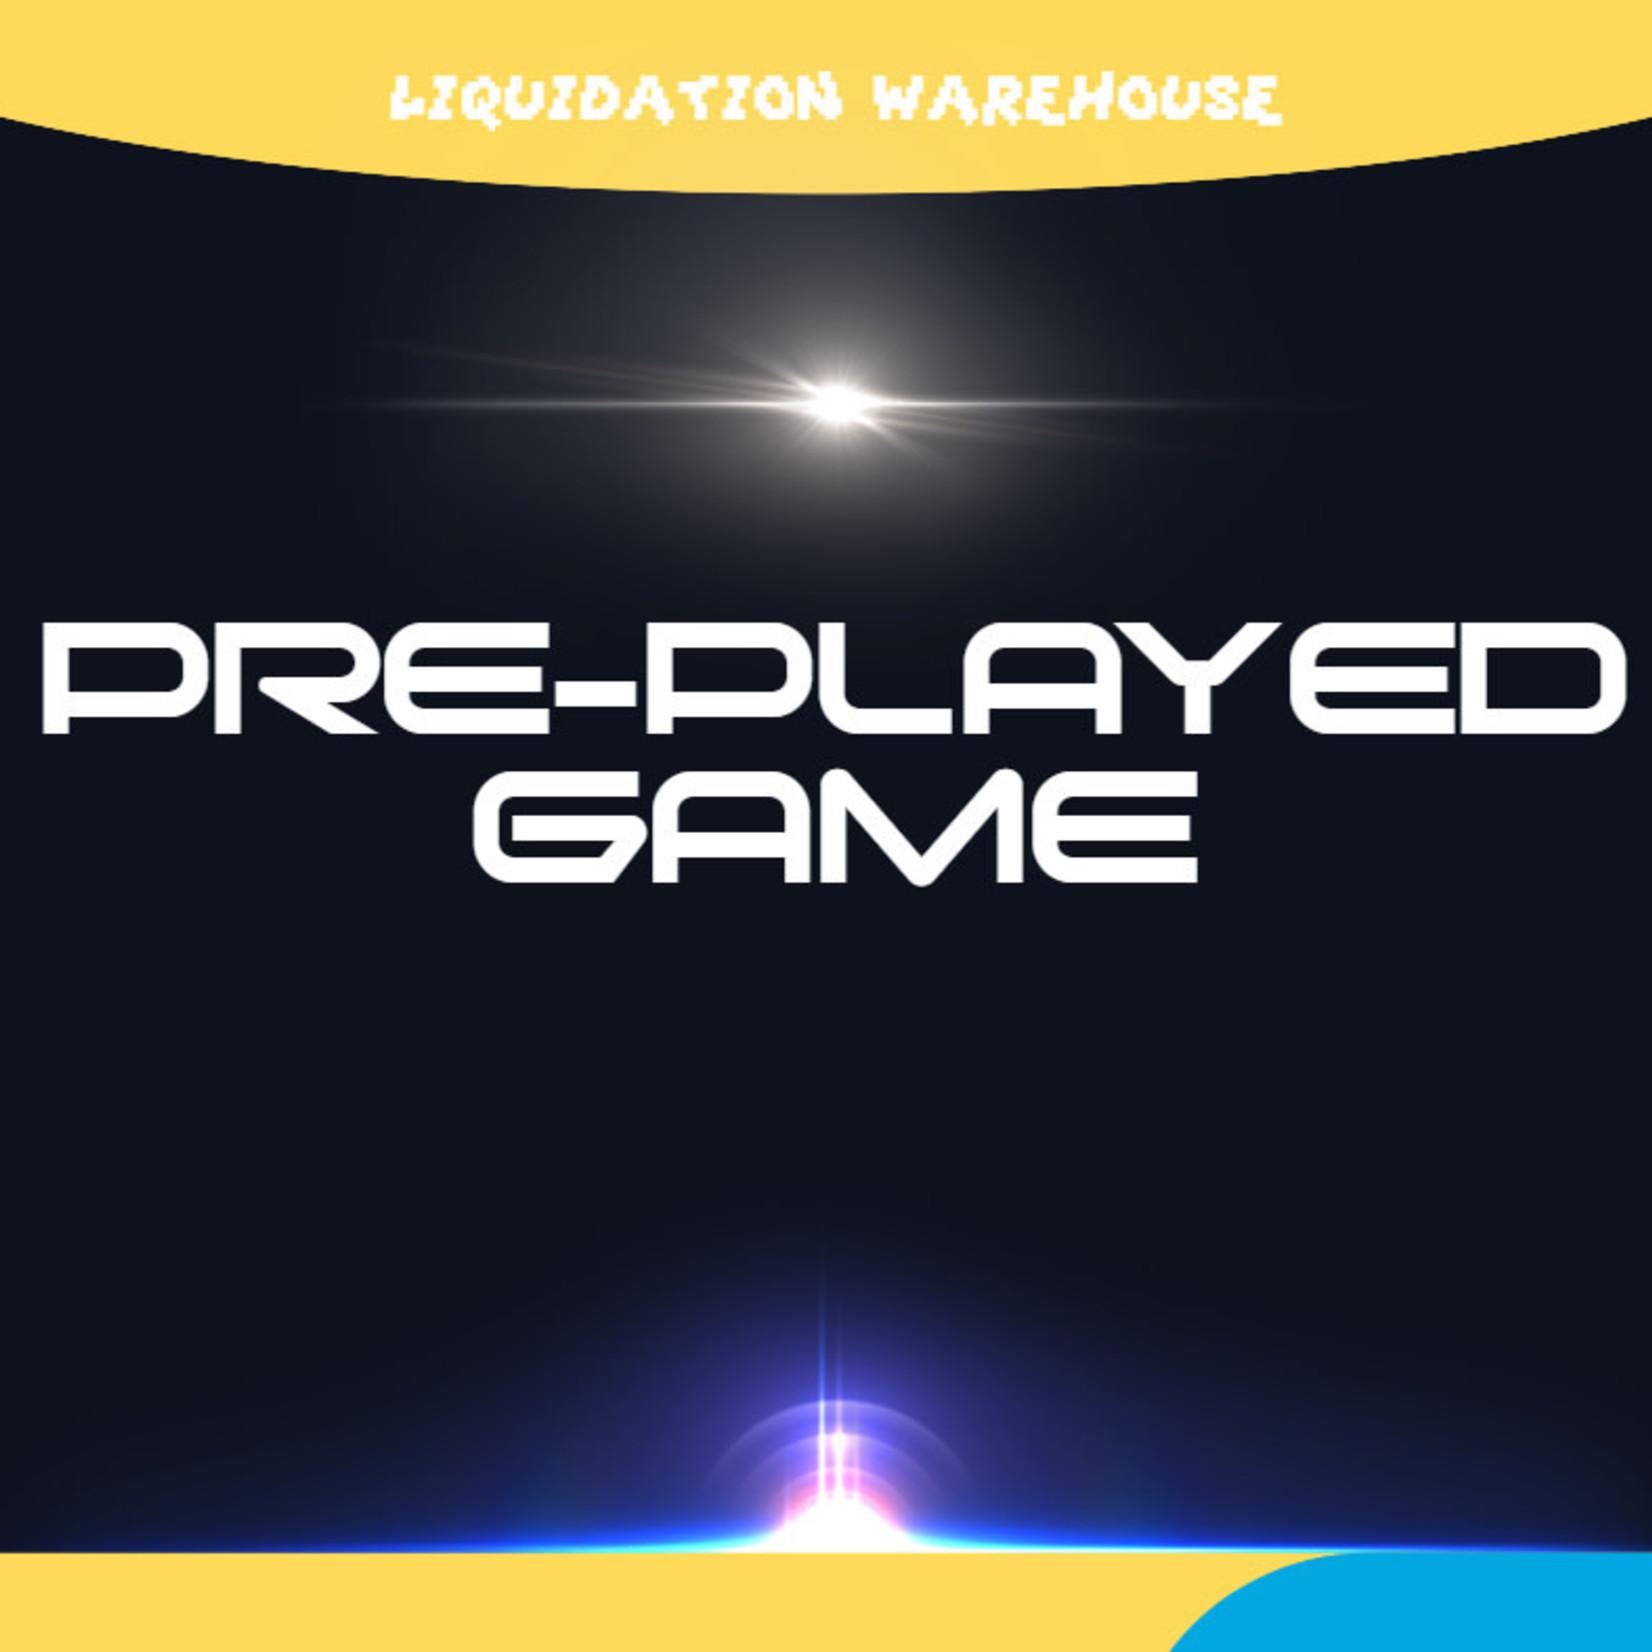 Wii U Just Dance 2017 - Pre-played